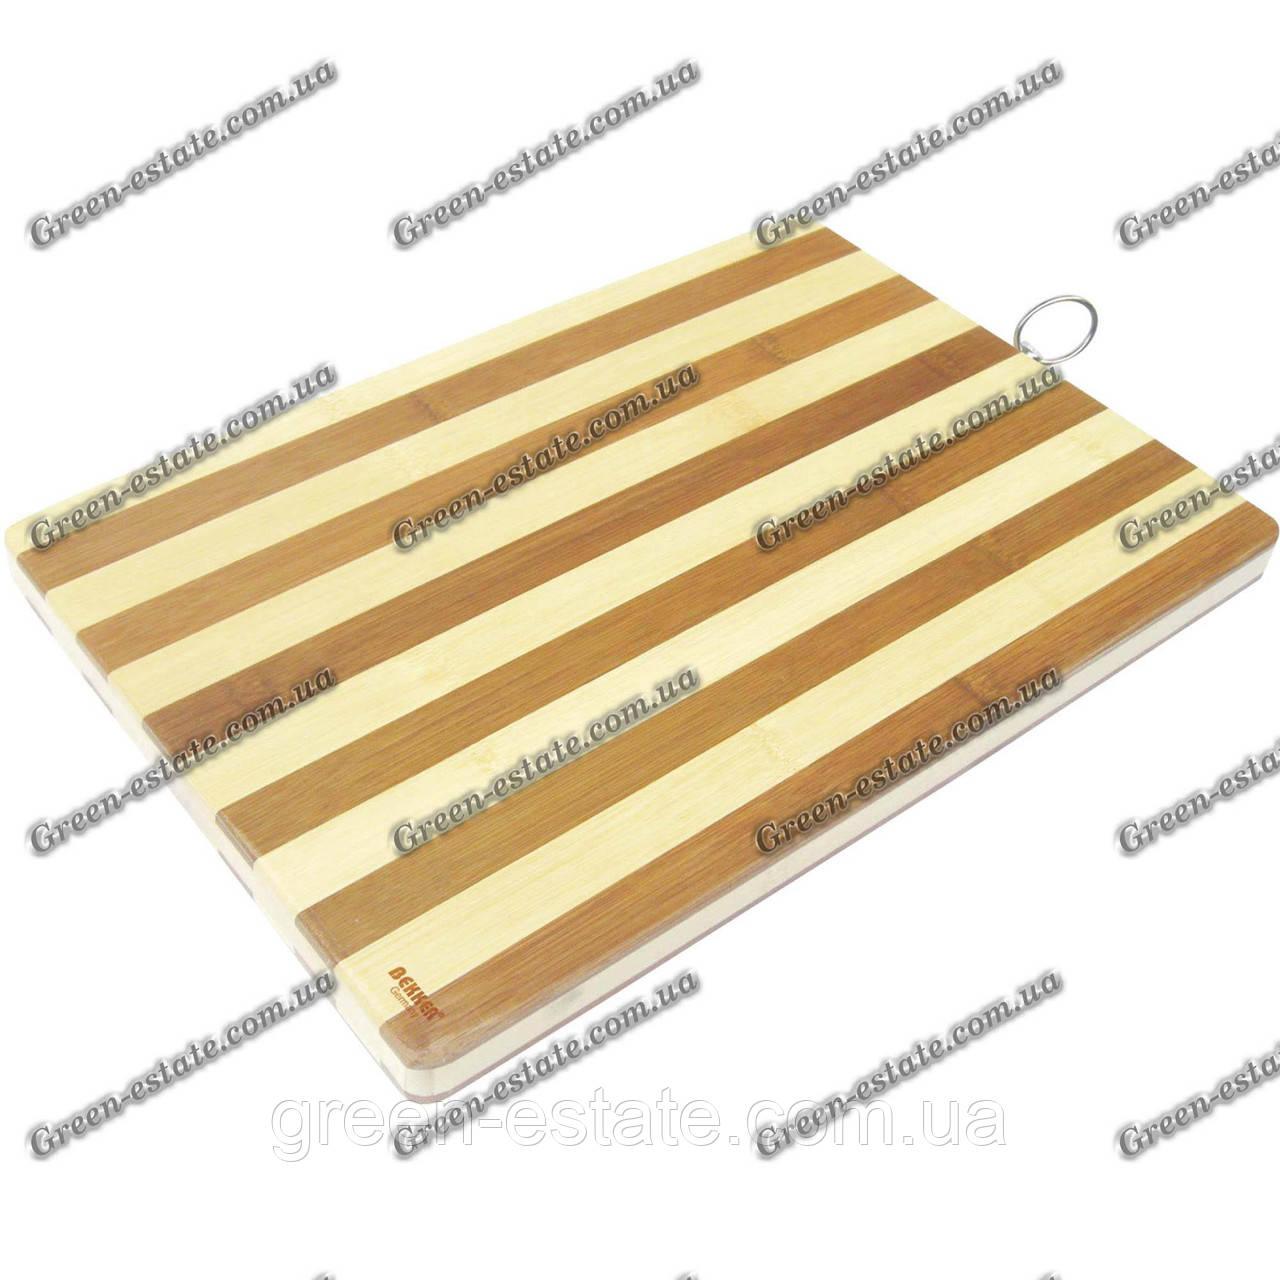 Досточка разделочная бамбук 30*20*0.7